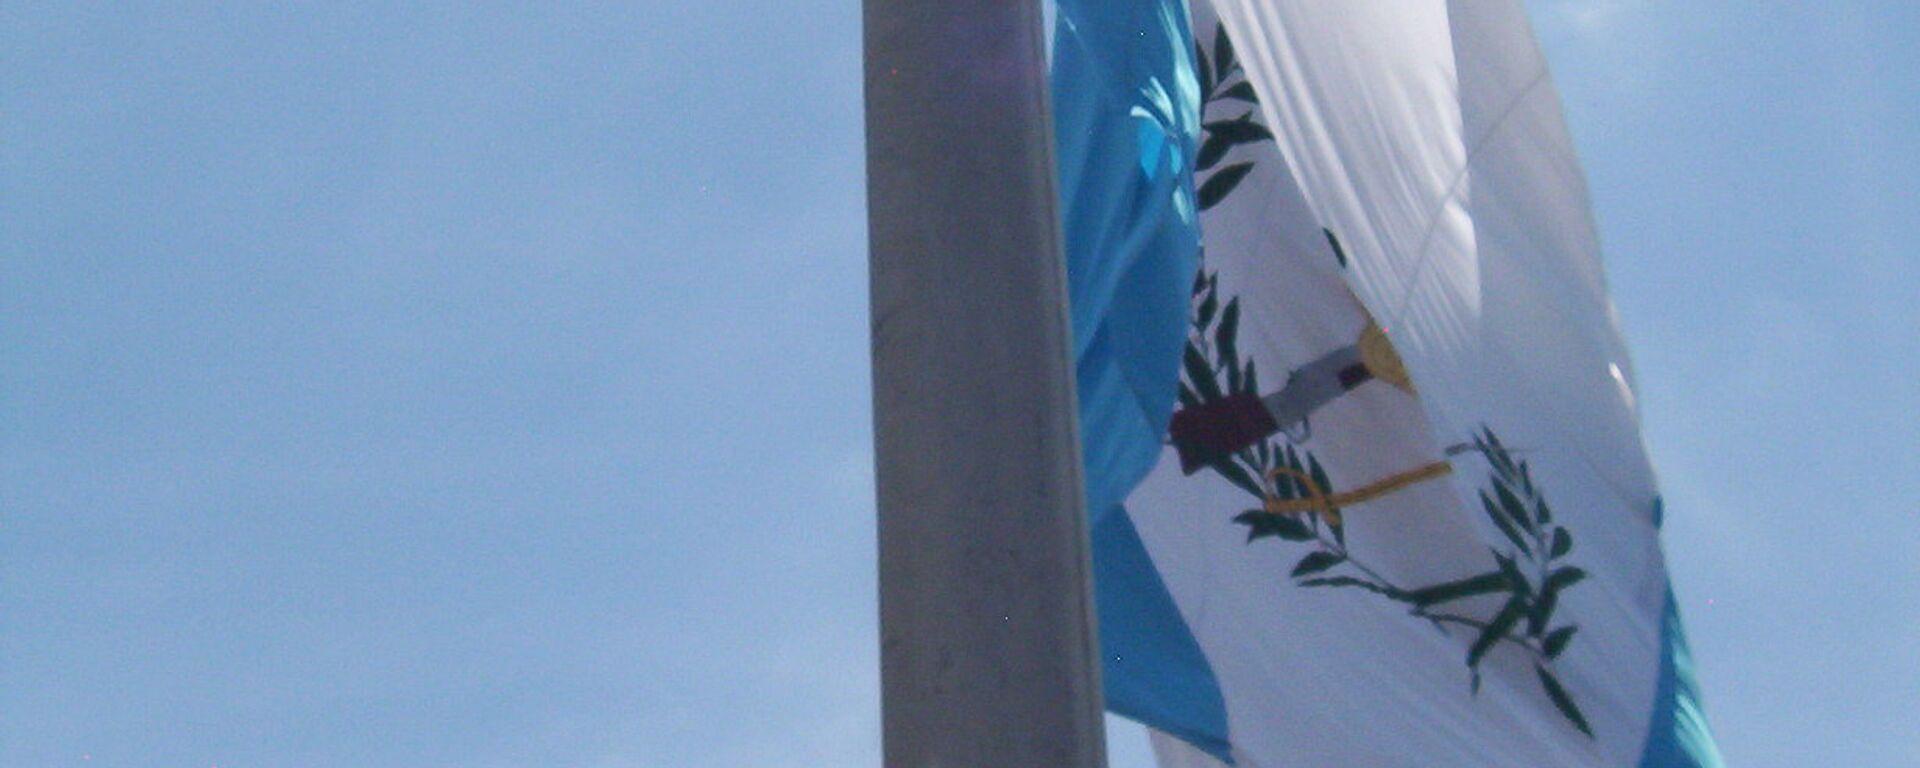 Bandera de Guatemala - Sputnik Mundo, 1920, 03.08.2021